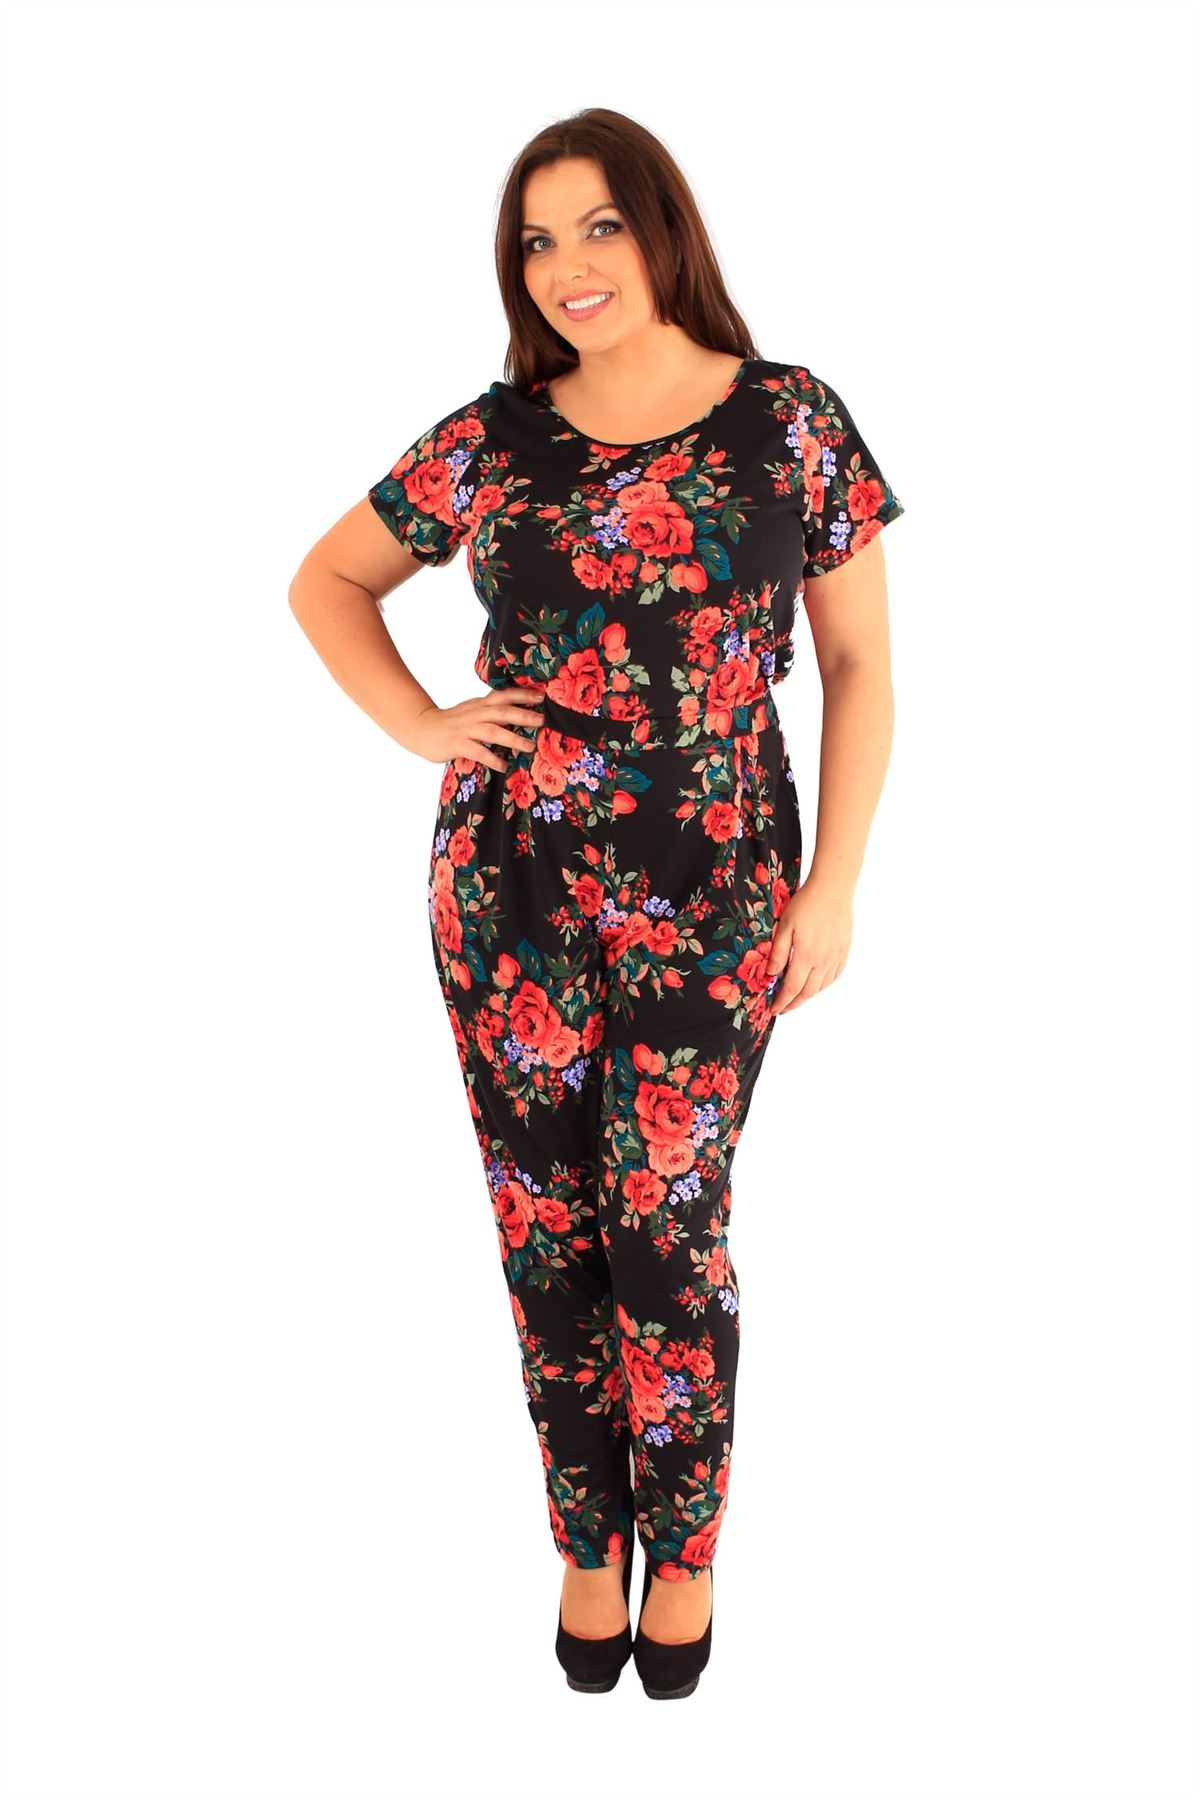 6adf3d0726 New Womens Plus Size Multi Color Rose Floral Print Jumpsuits Long ...